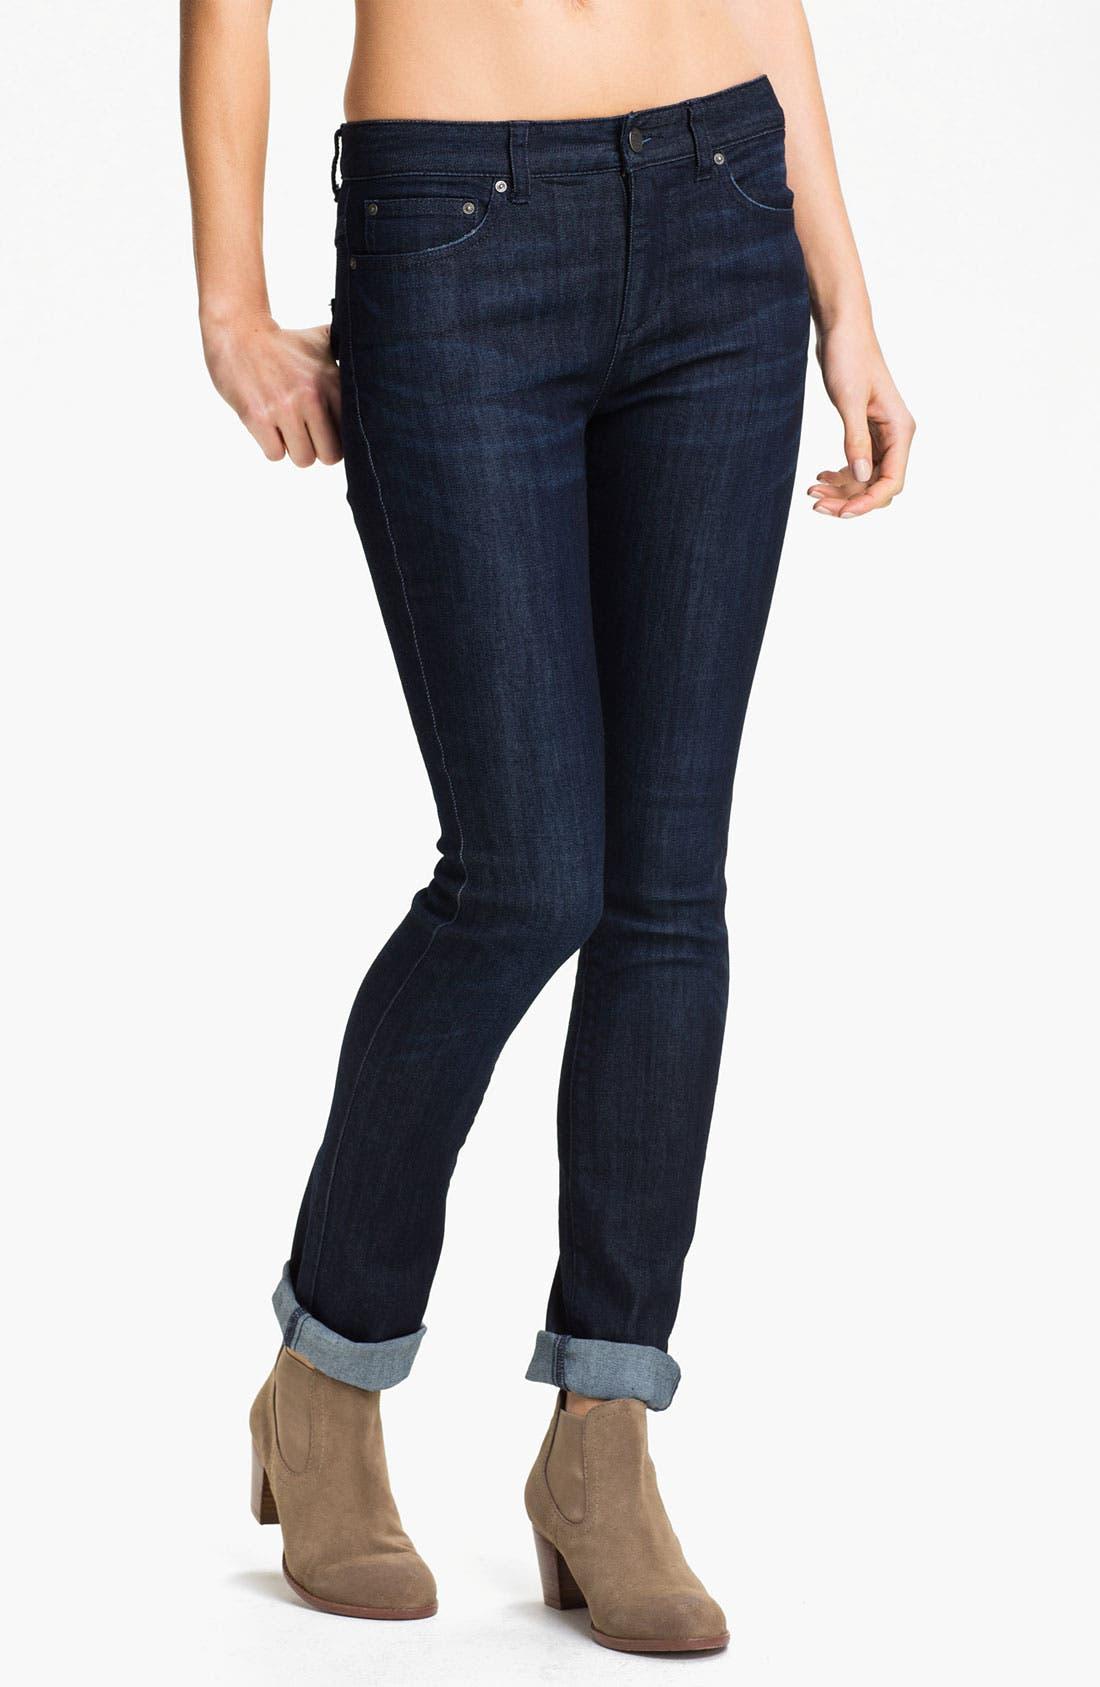 Main Image - Free People Stretch Denim Skinny Jeans (Dark Eagle Blue Wash)